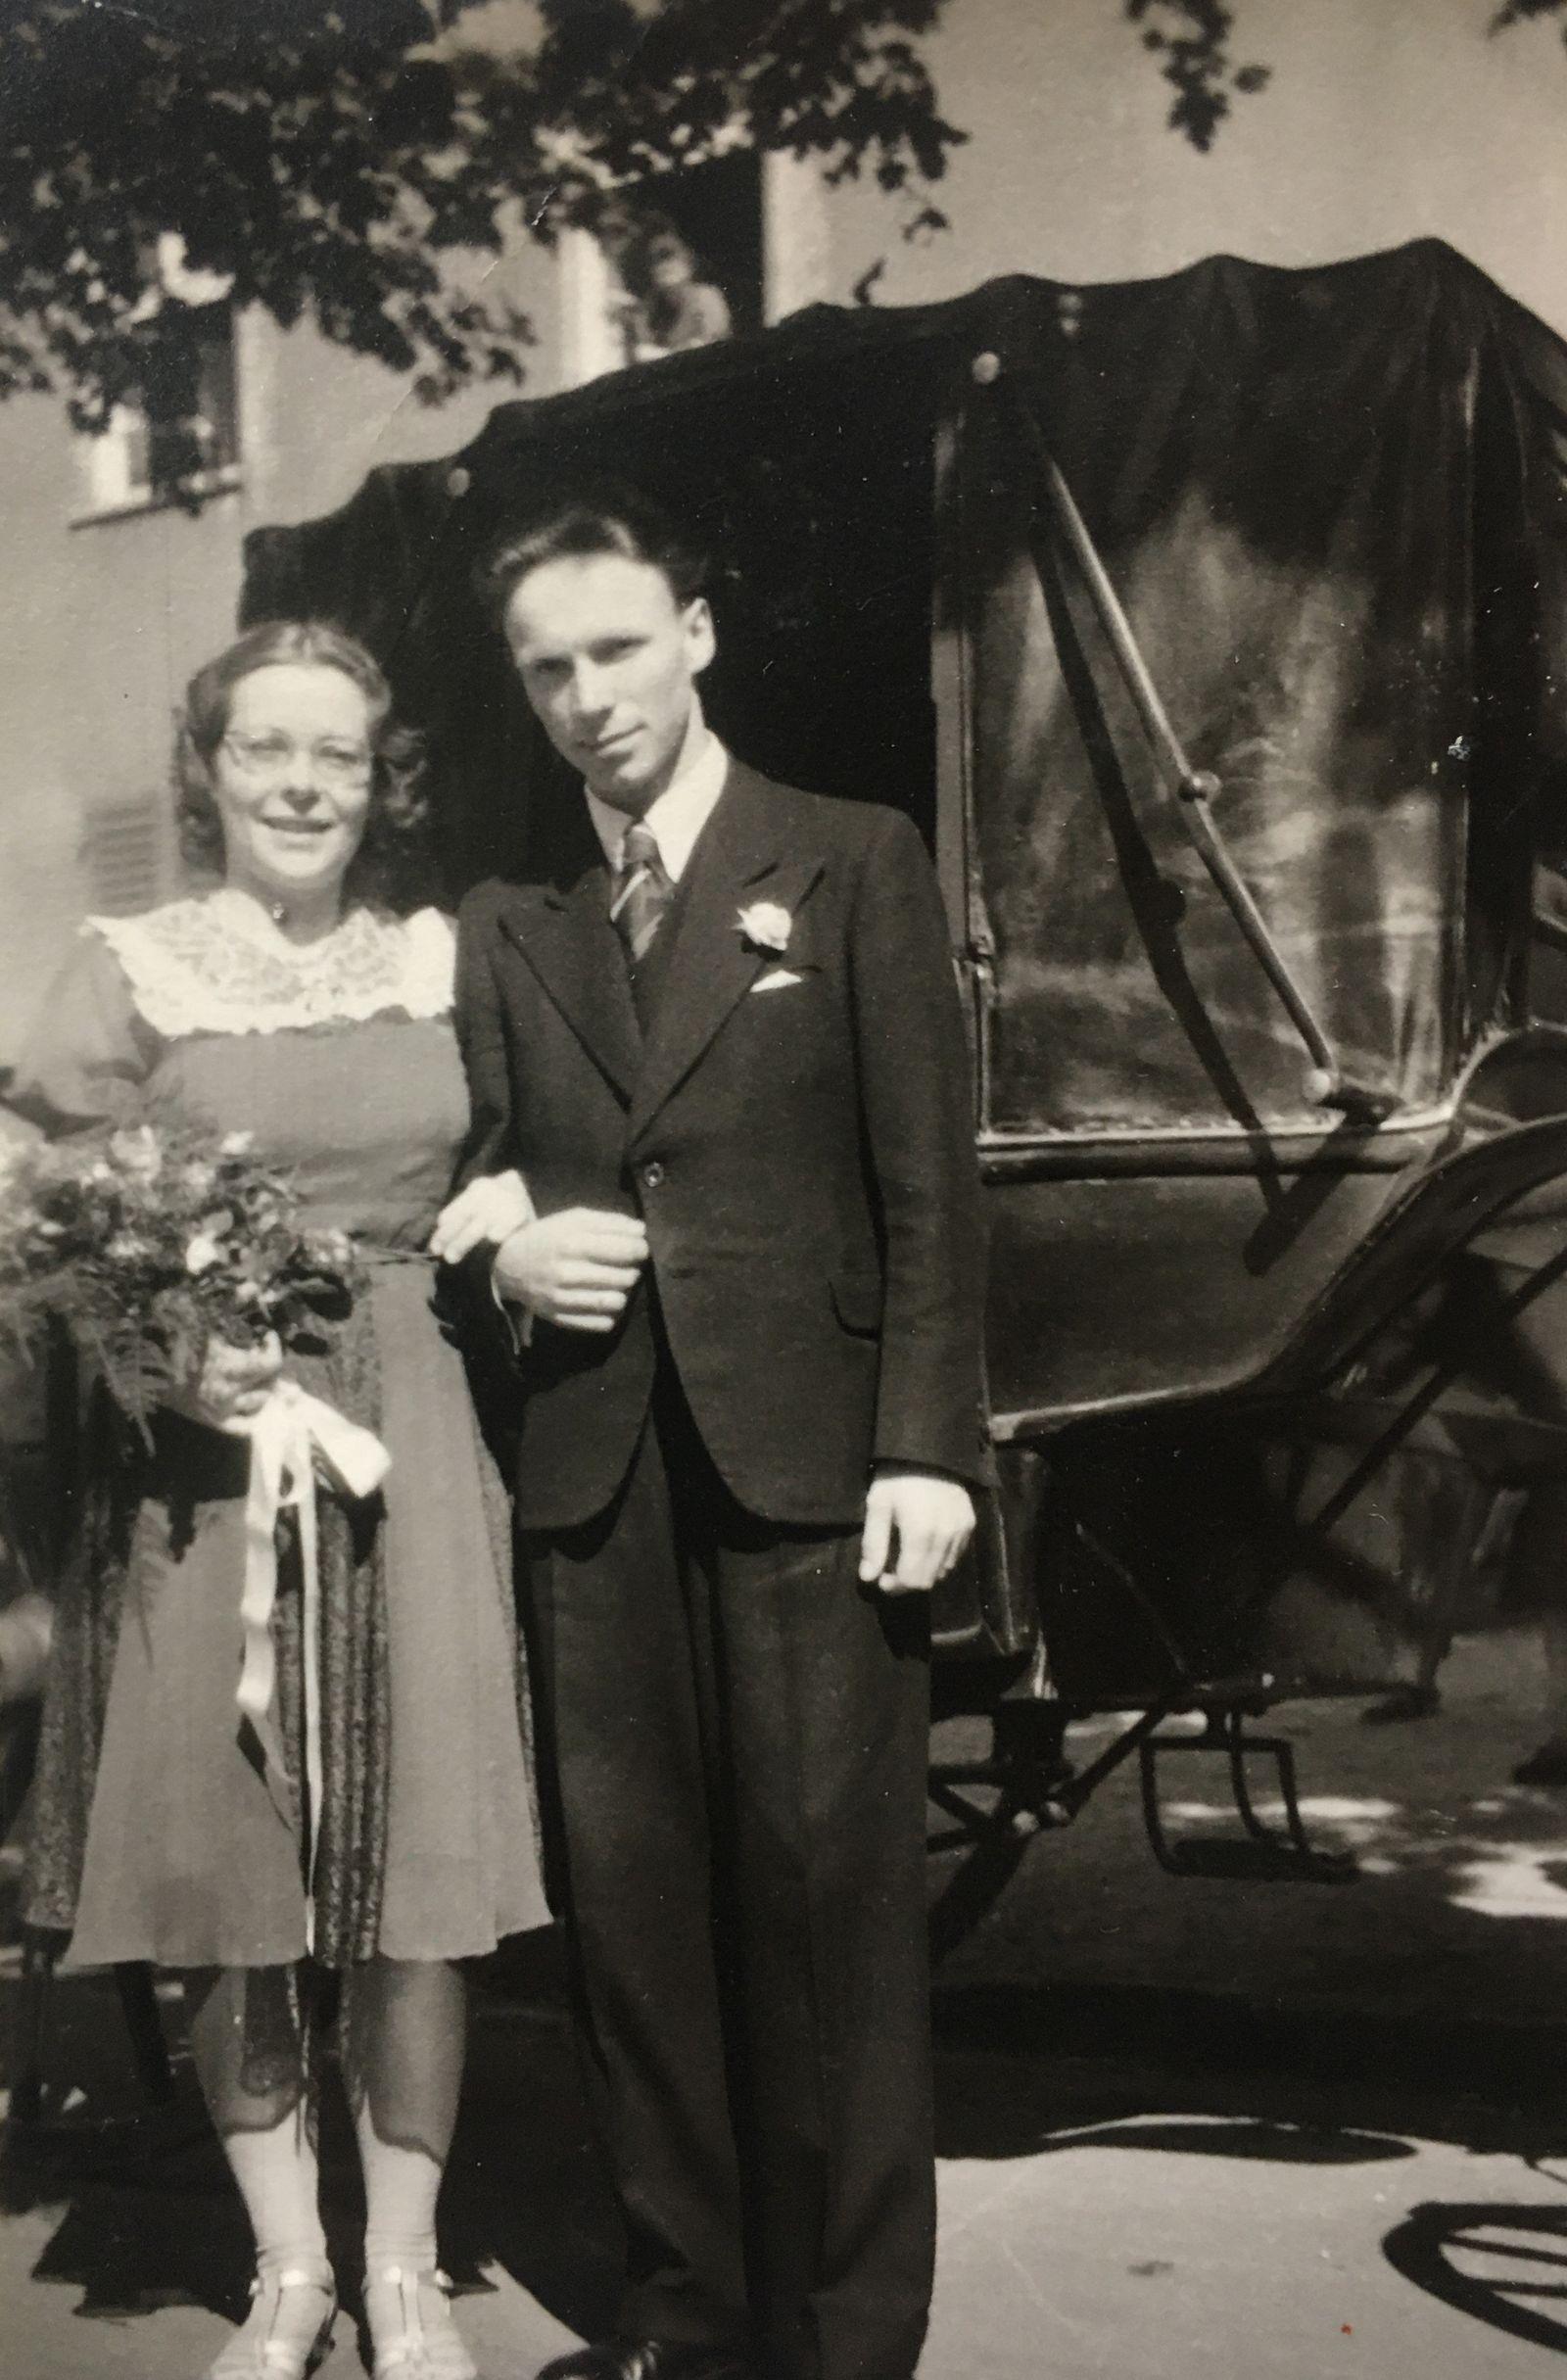 Bombardierung Dresden - Familie Petra Roschinsky - Hochzeitsfoto